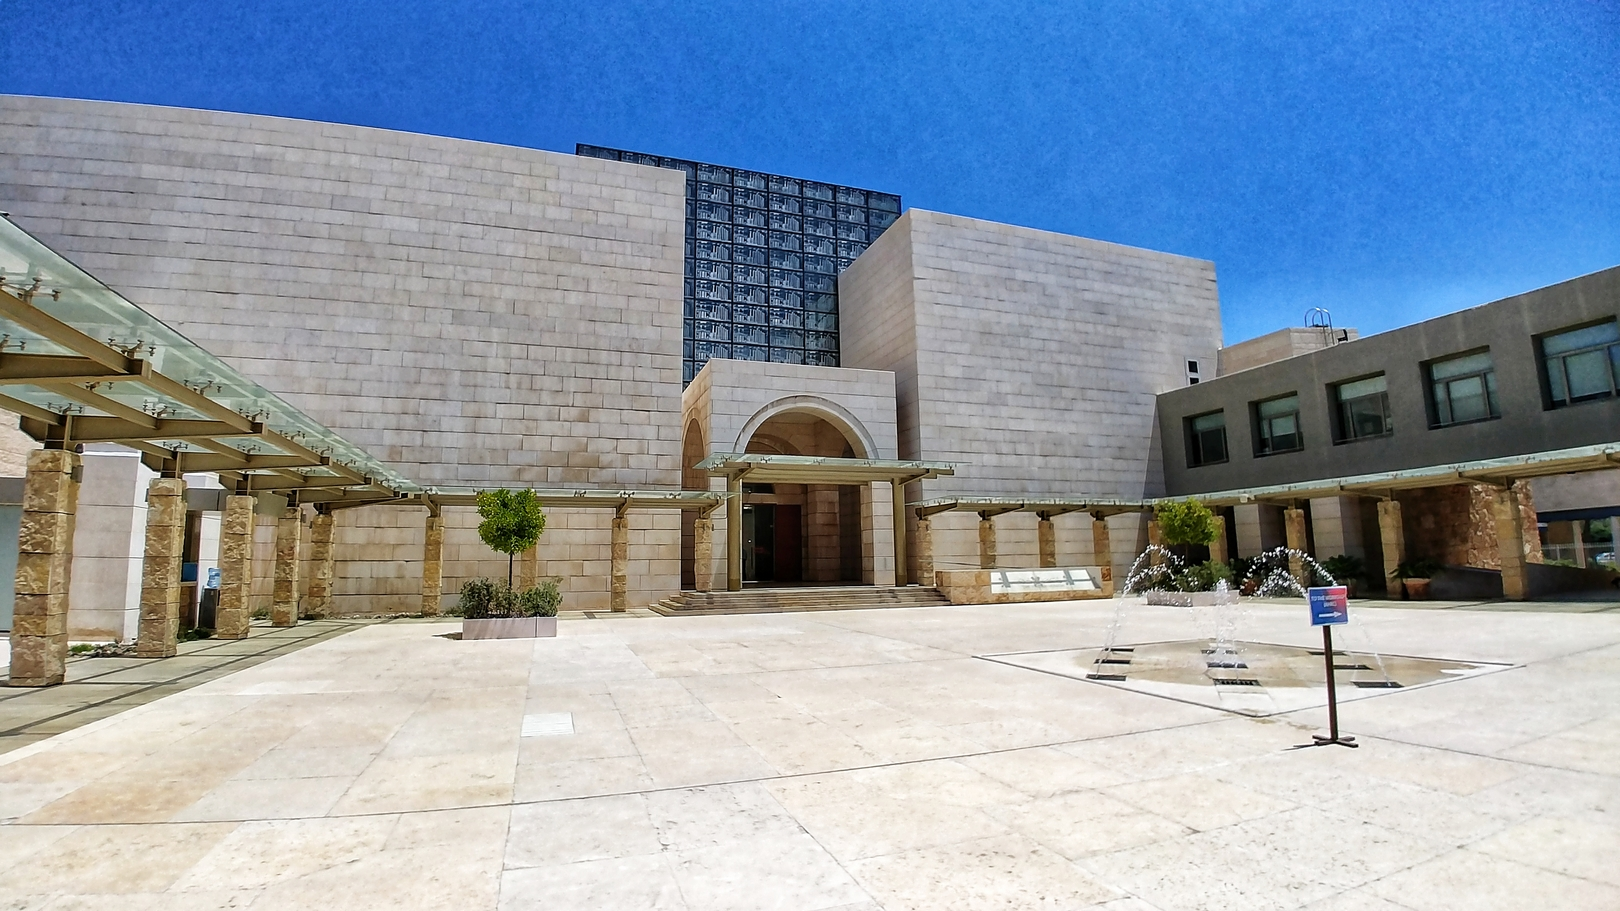 Jordanie - Jordan Museum à Amman